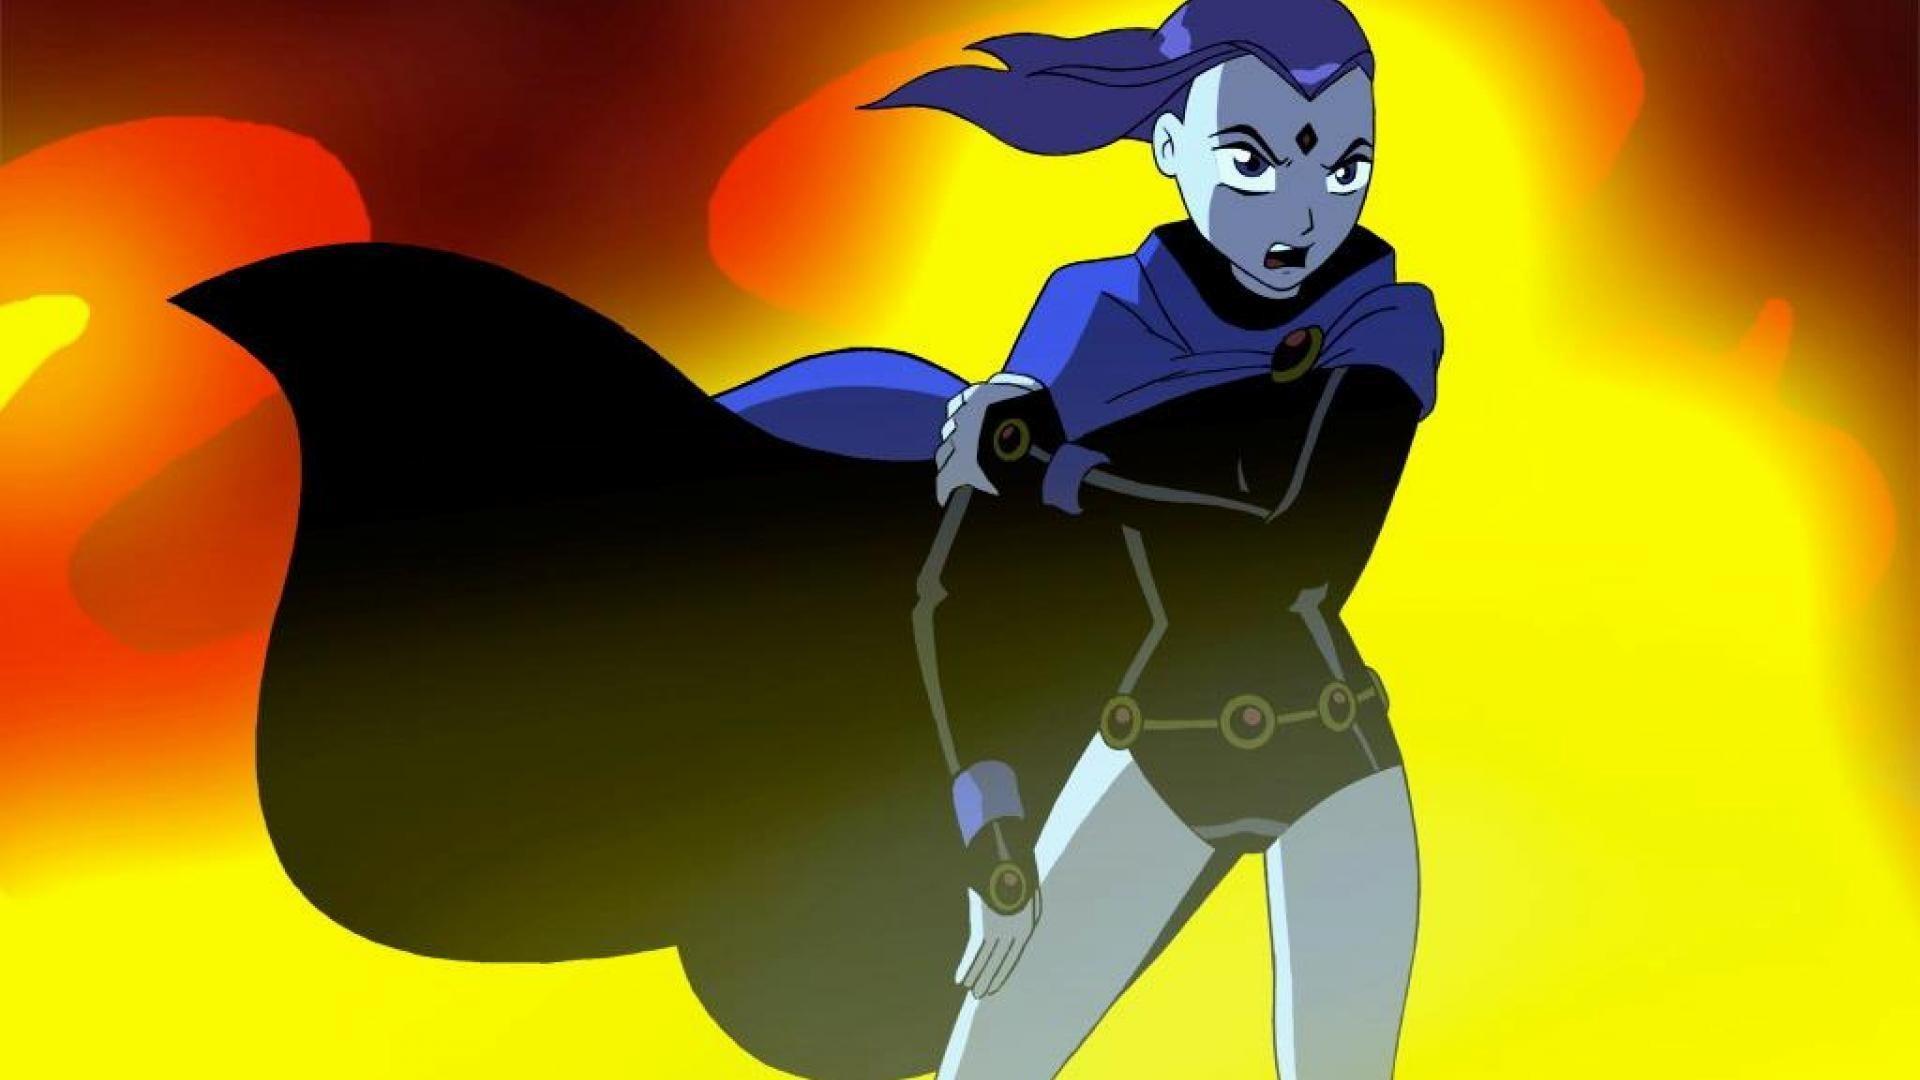 wallpaper.wiki-Raven-Teen-Titans-Background-Download-Free-